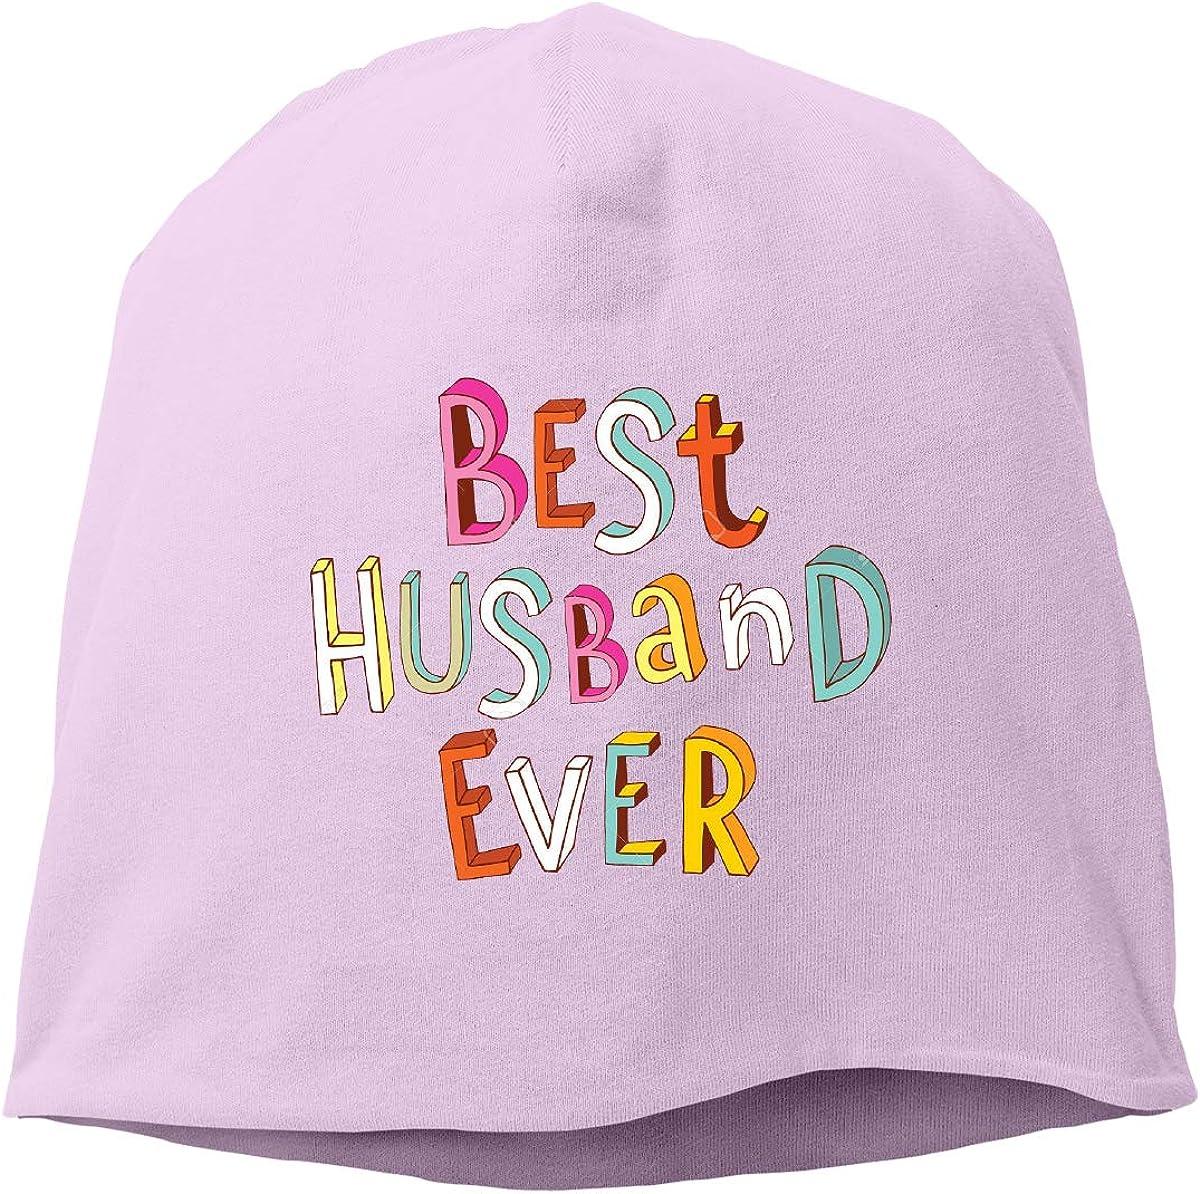 Best Husband Ever Skull Cap Helmet Liner Beanie Cap for Men Hip Hop Hedging Head Hat